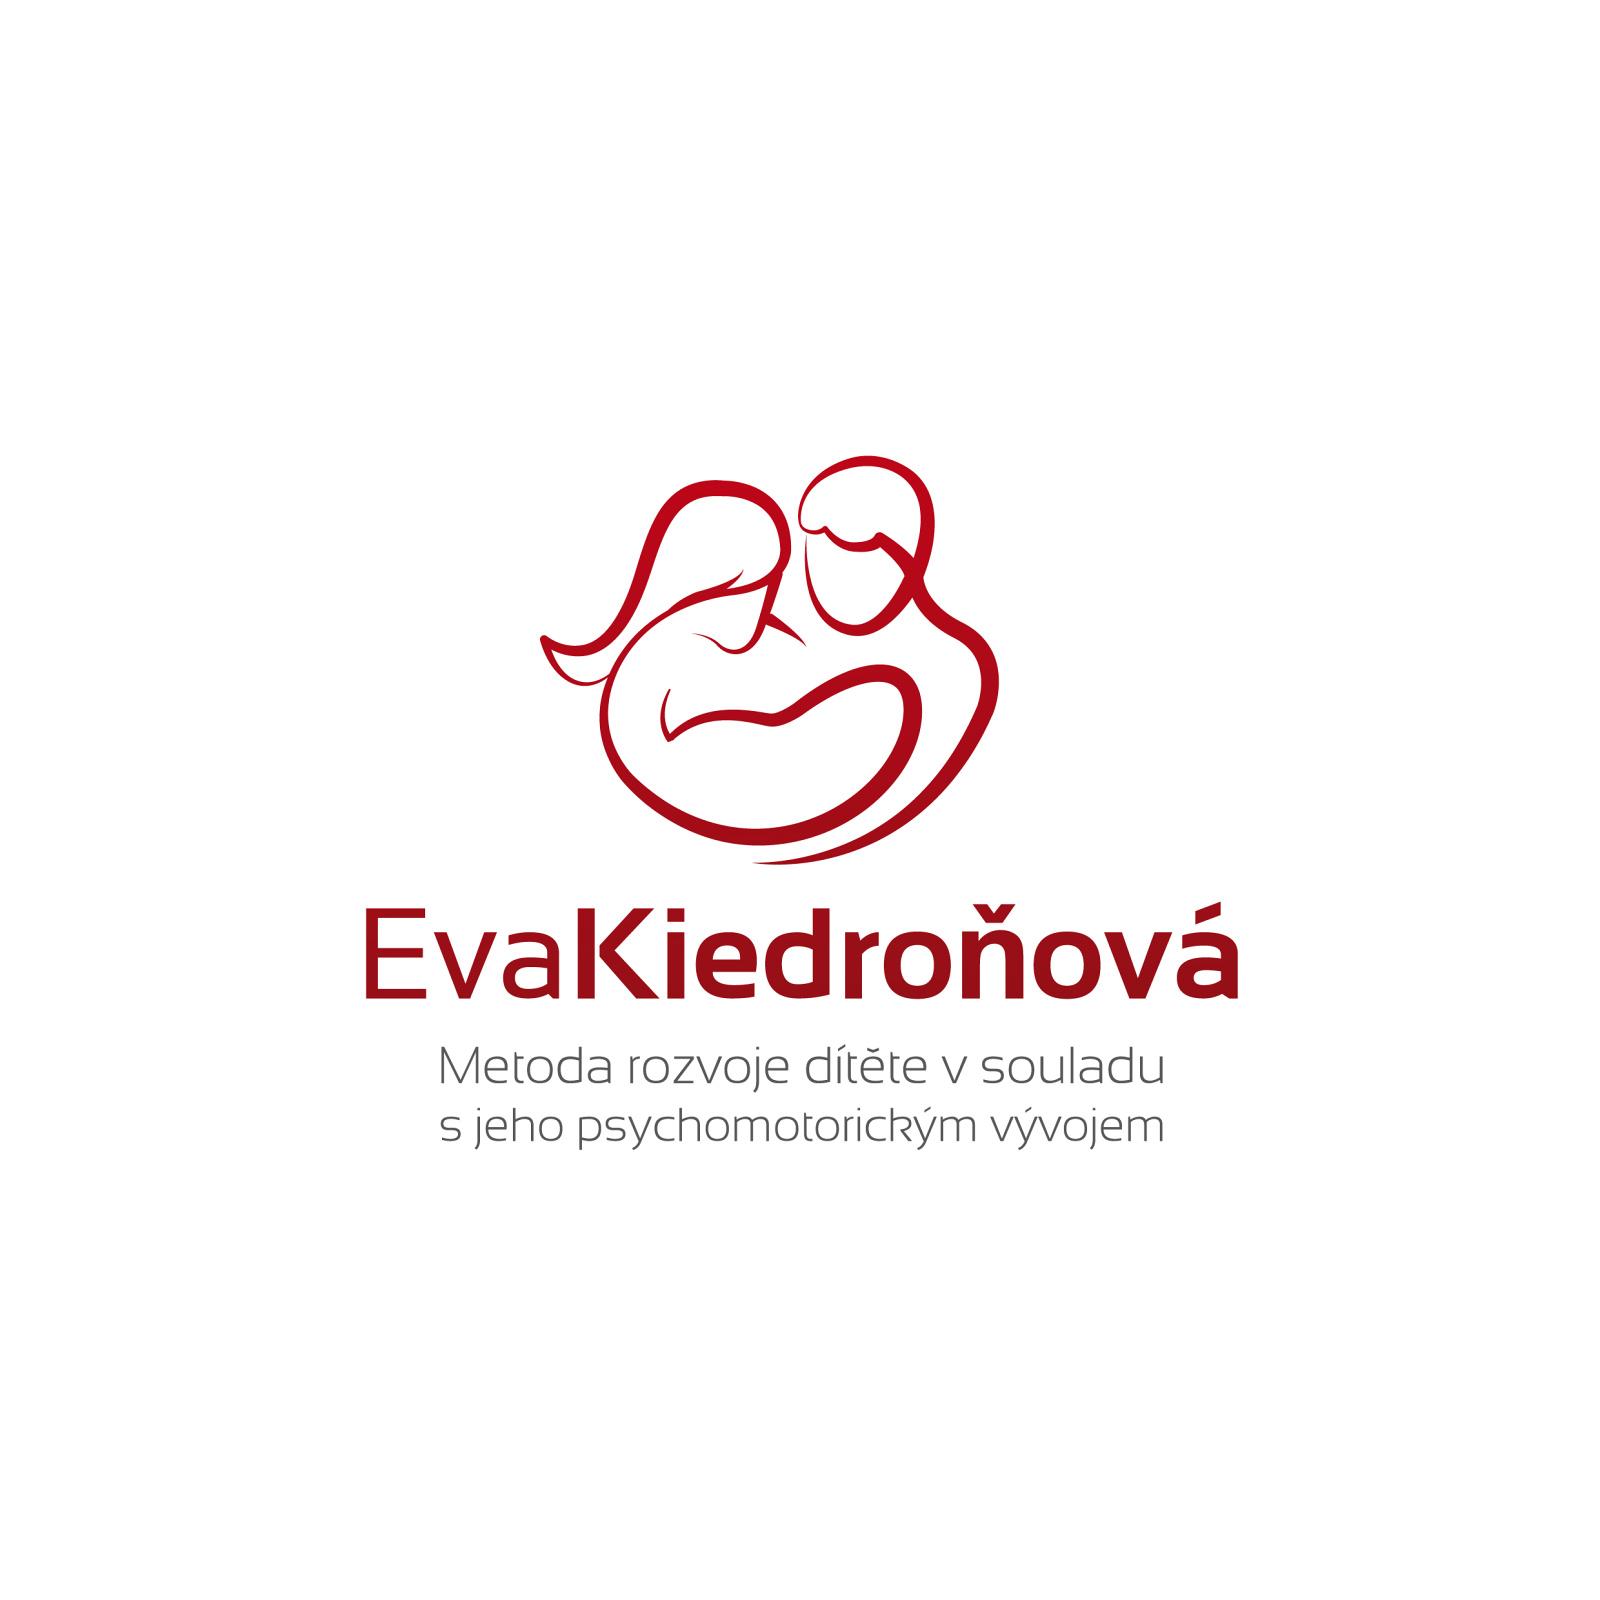 Výsledek obrázku pro Eva Kiedroňová logo